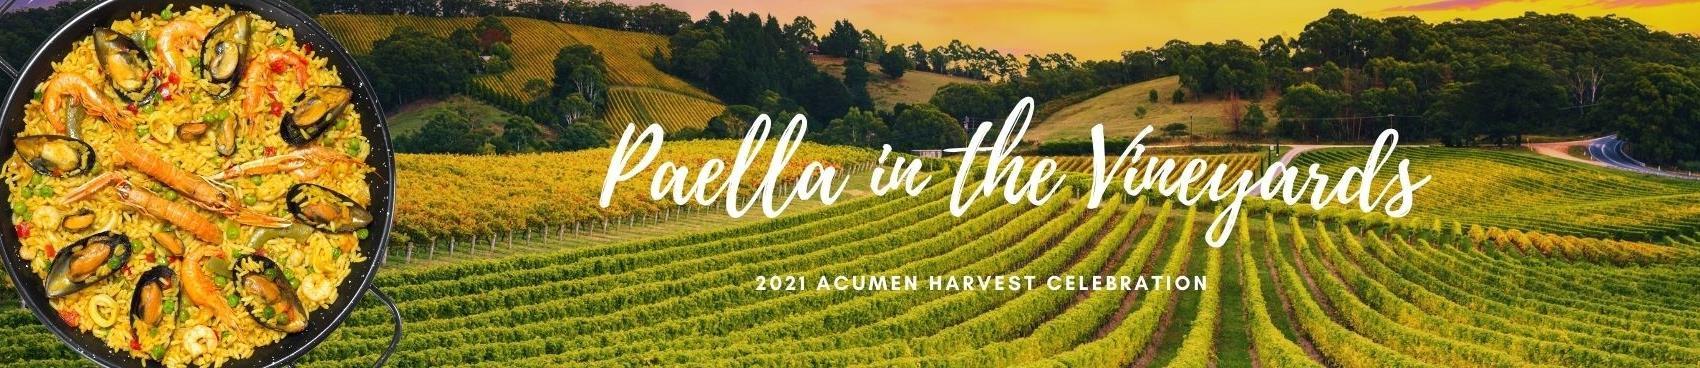 Paella in the Vineyards Harvest Celebration